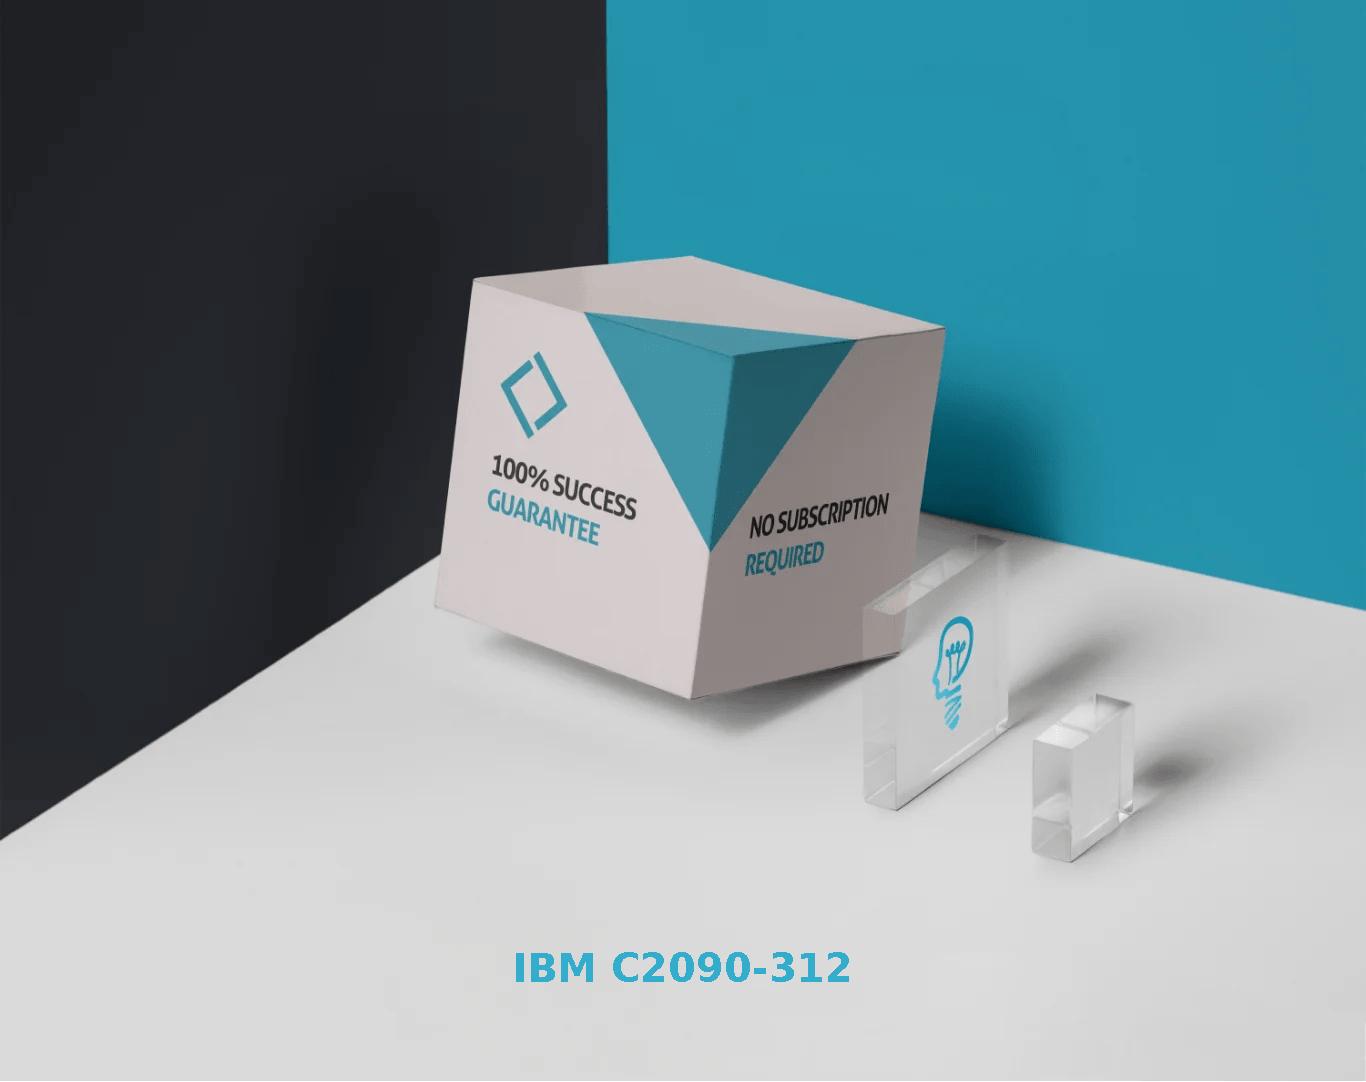 IBM C2090-312 Exams